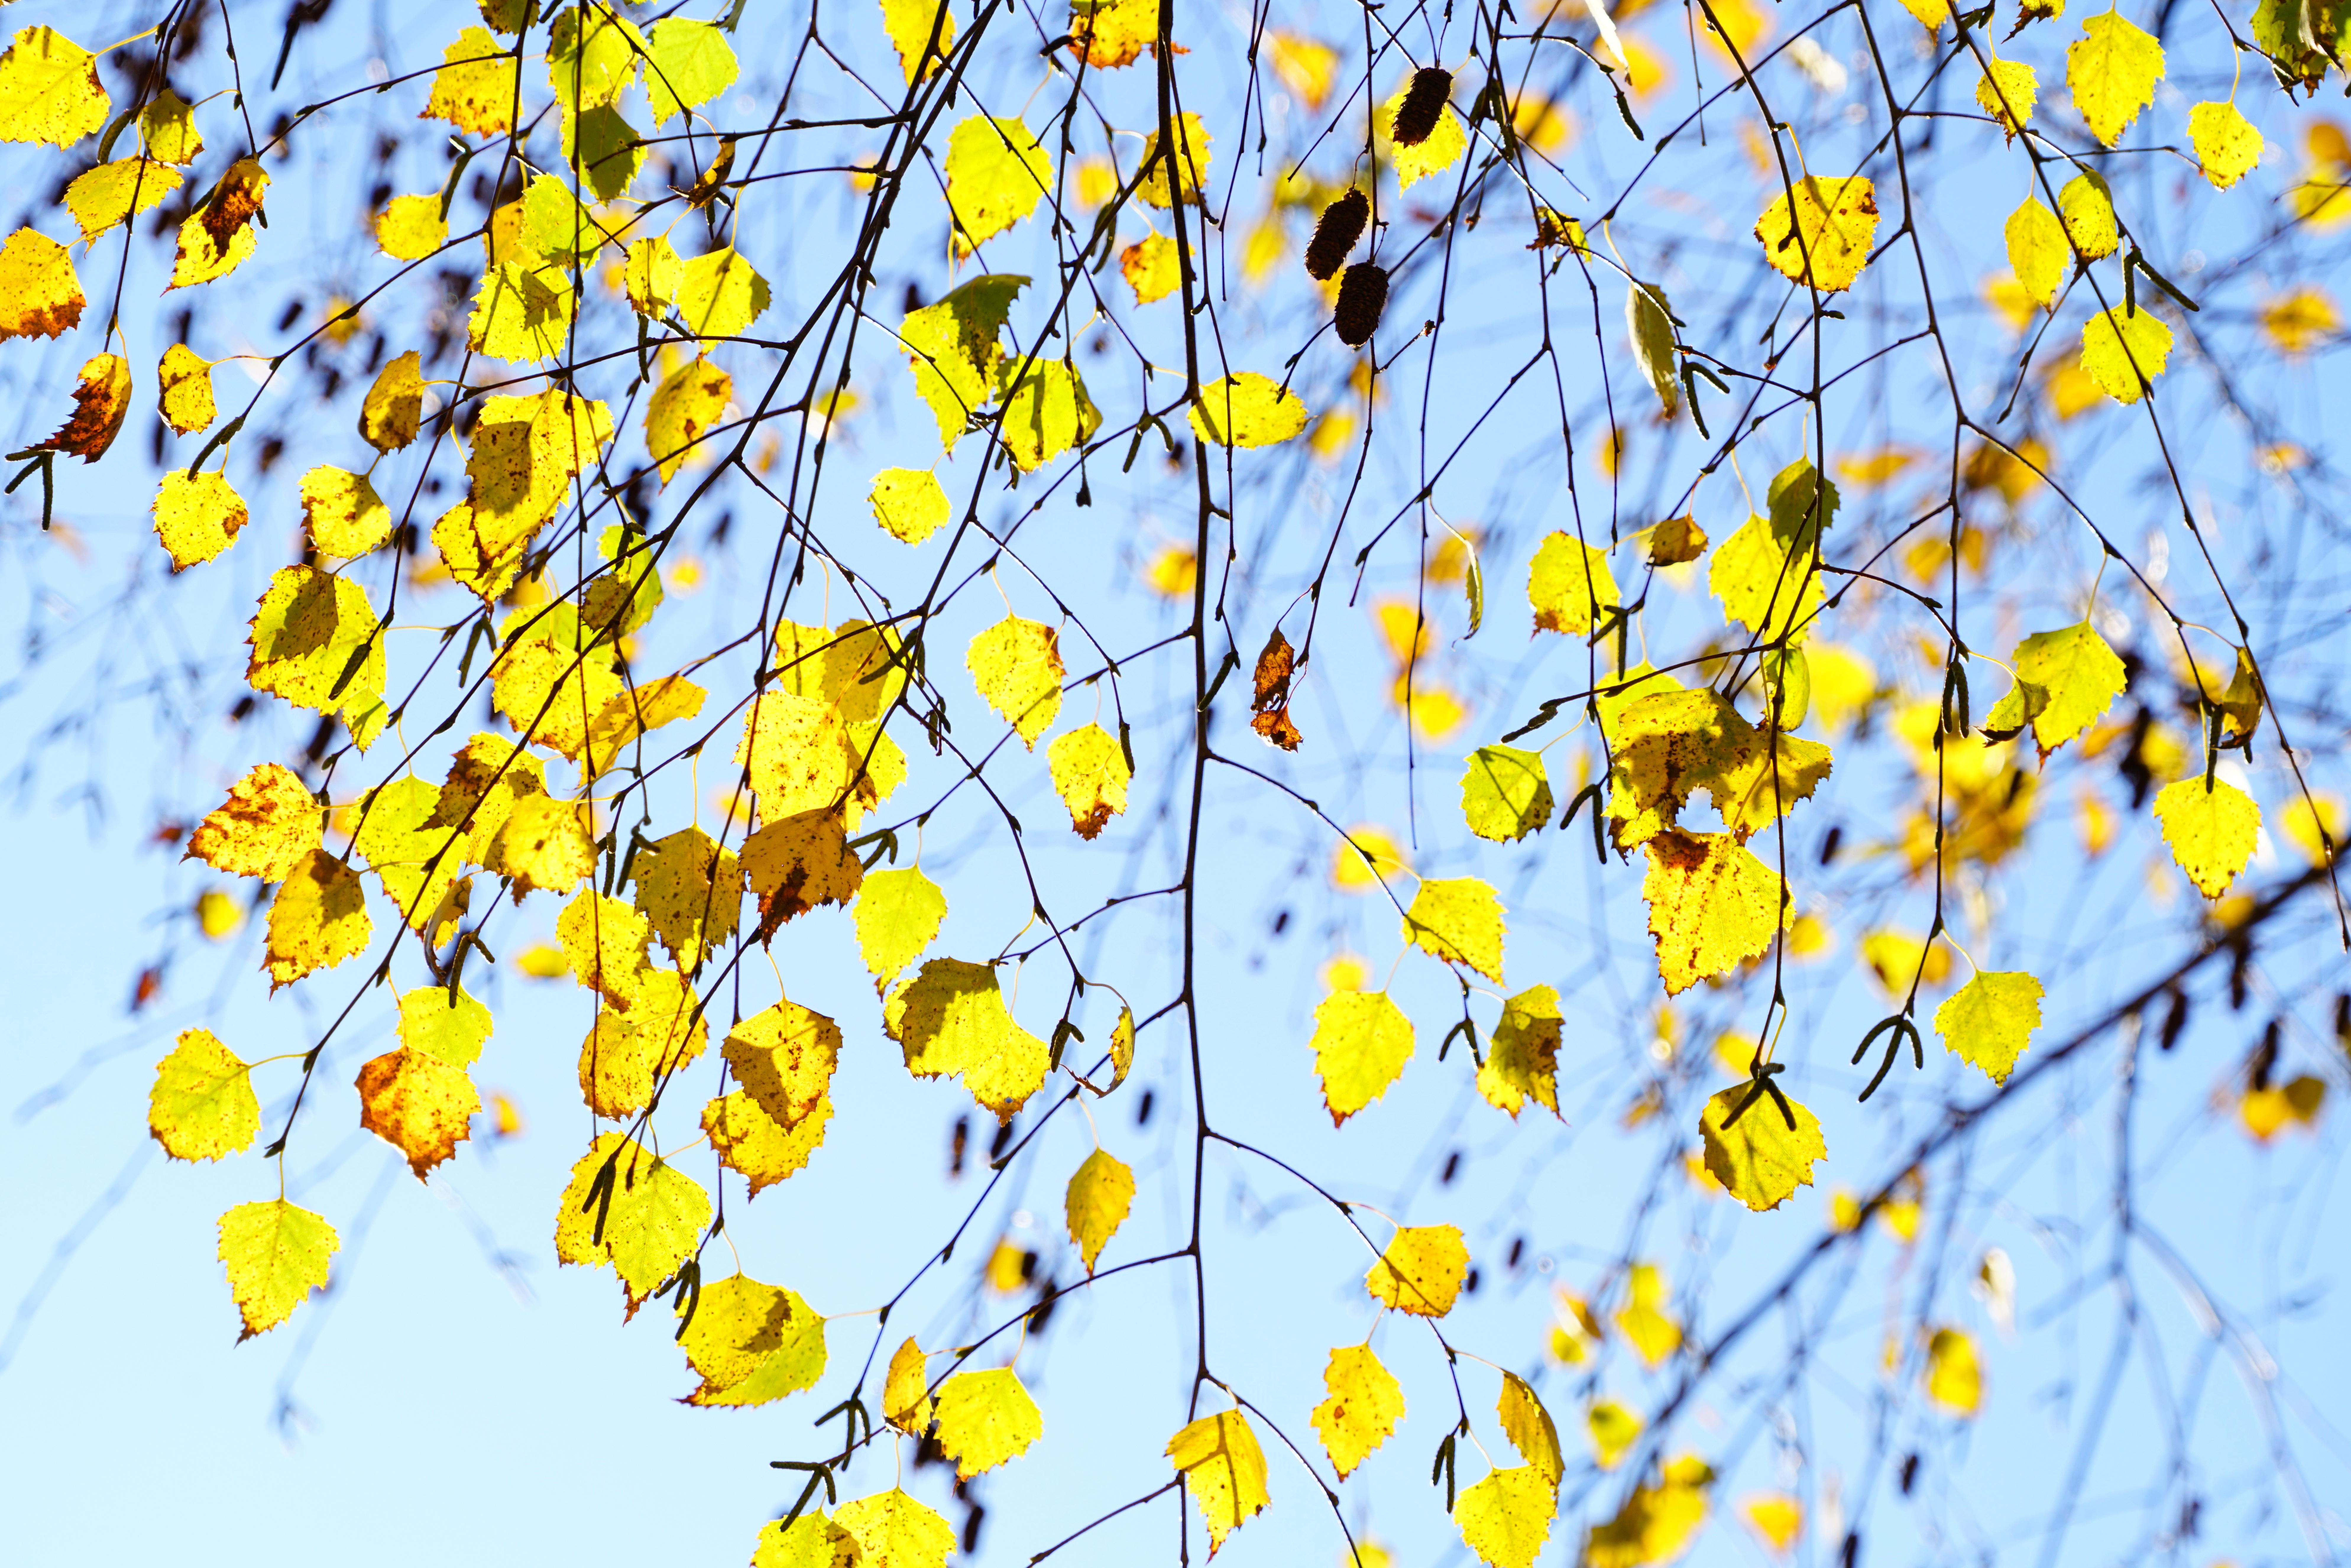 Fotos gratis : árbol, rama, ligero, cielo, flor, pétalo, patrón ...